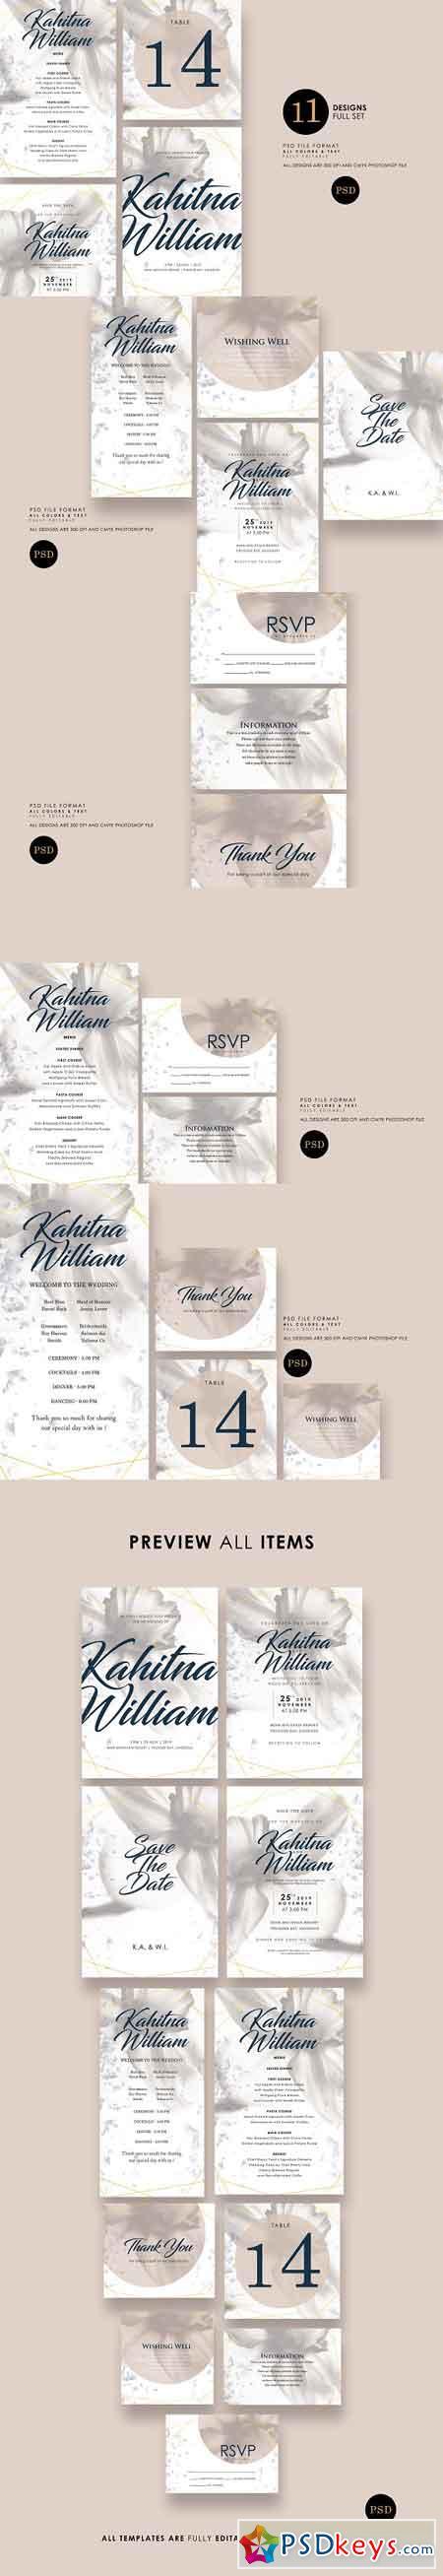 Classic Wedding Invitation Ac.9 2685112